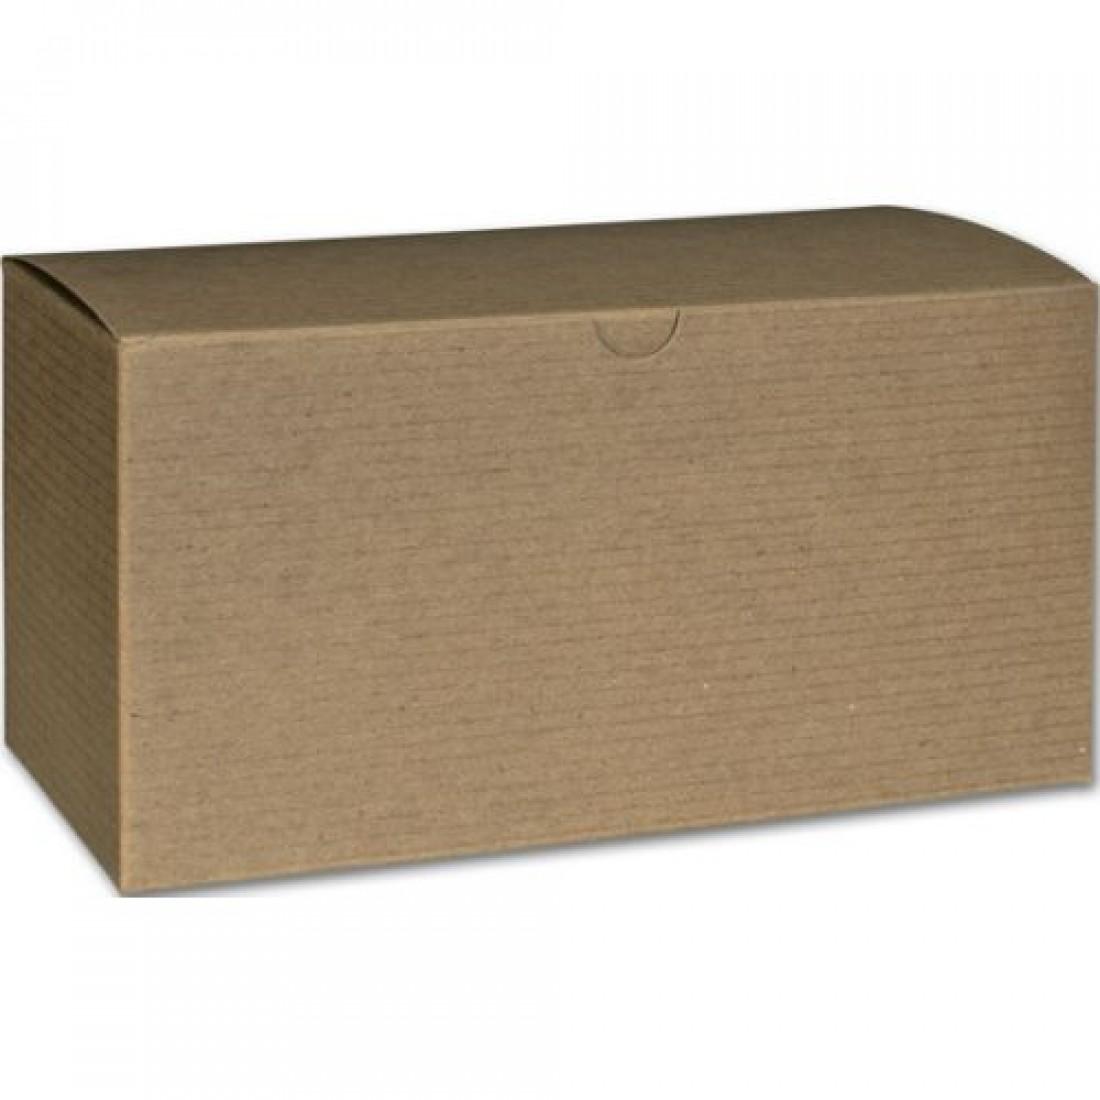 Kraft 1PC Gift Box 9x4.5x4.5